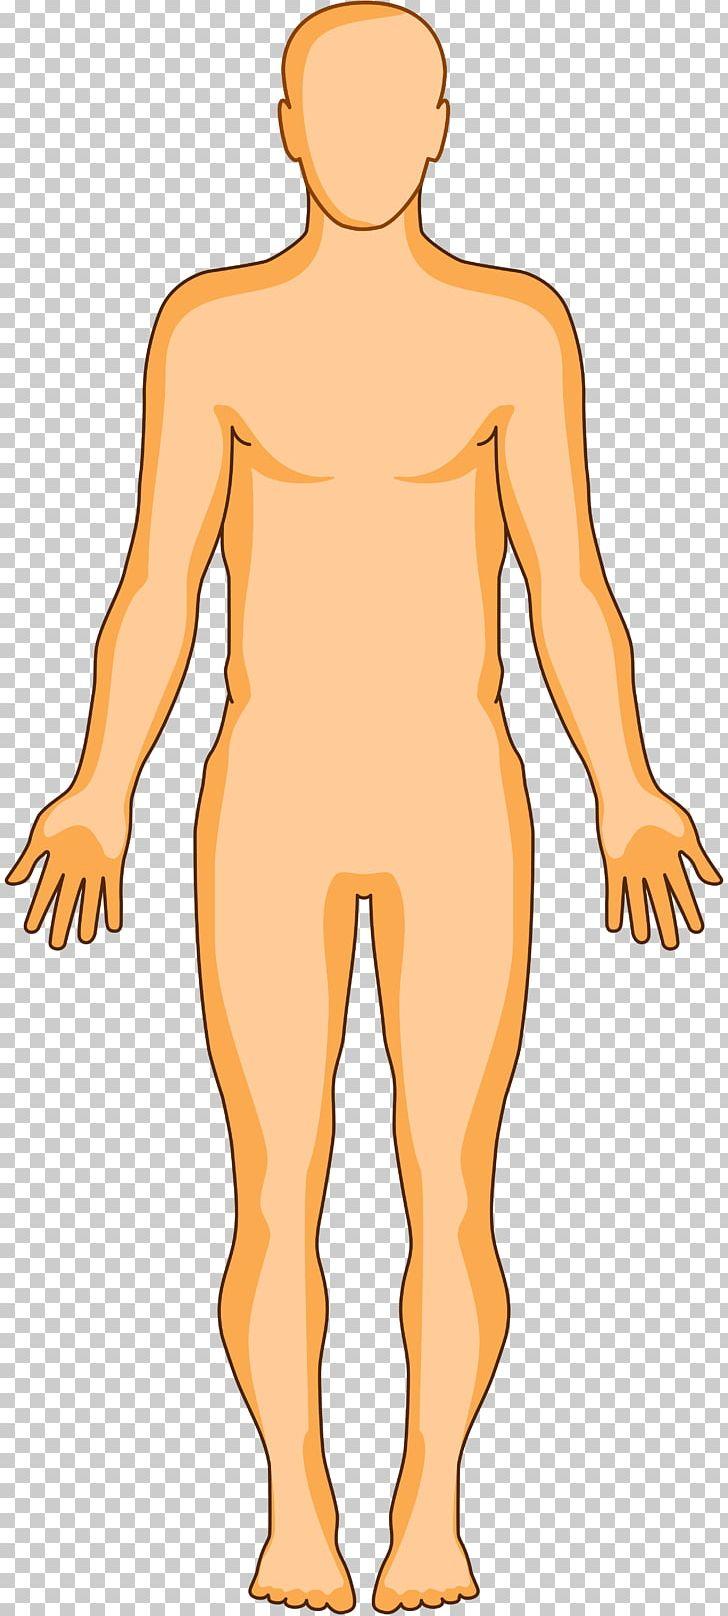 Human Body Organ Homo Sapiens Anatomy Human Skin PNG, Clipart, Abdomen, Arm, Art, Body, Brain Free PNG Download